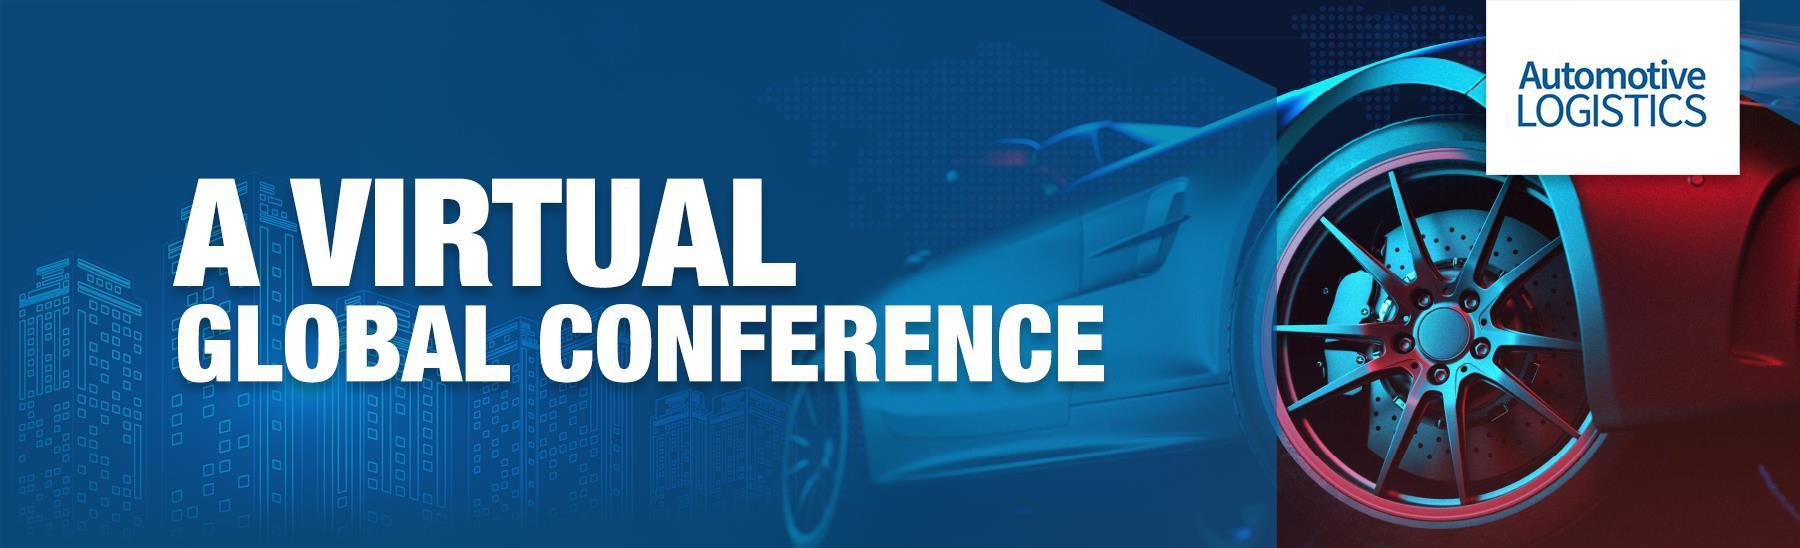 782-al-conference-web-main-virtual-v4-130720-300dpi-2